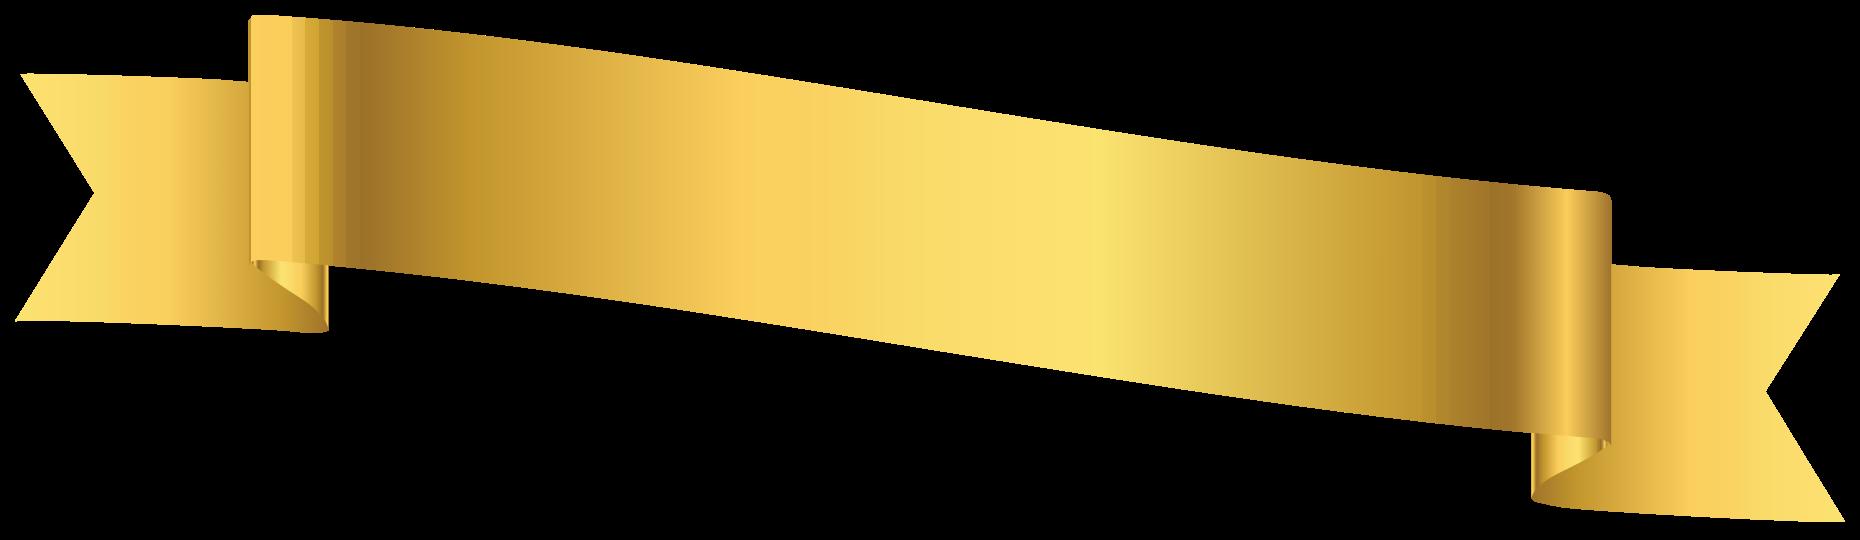 Golden ribbon png